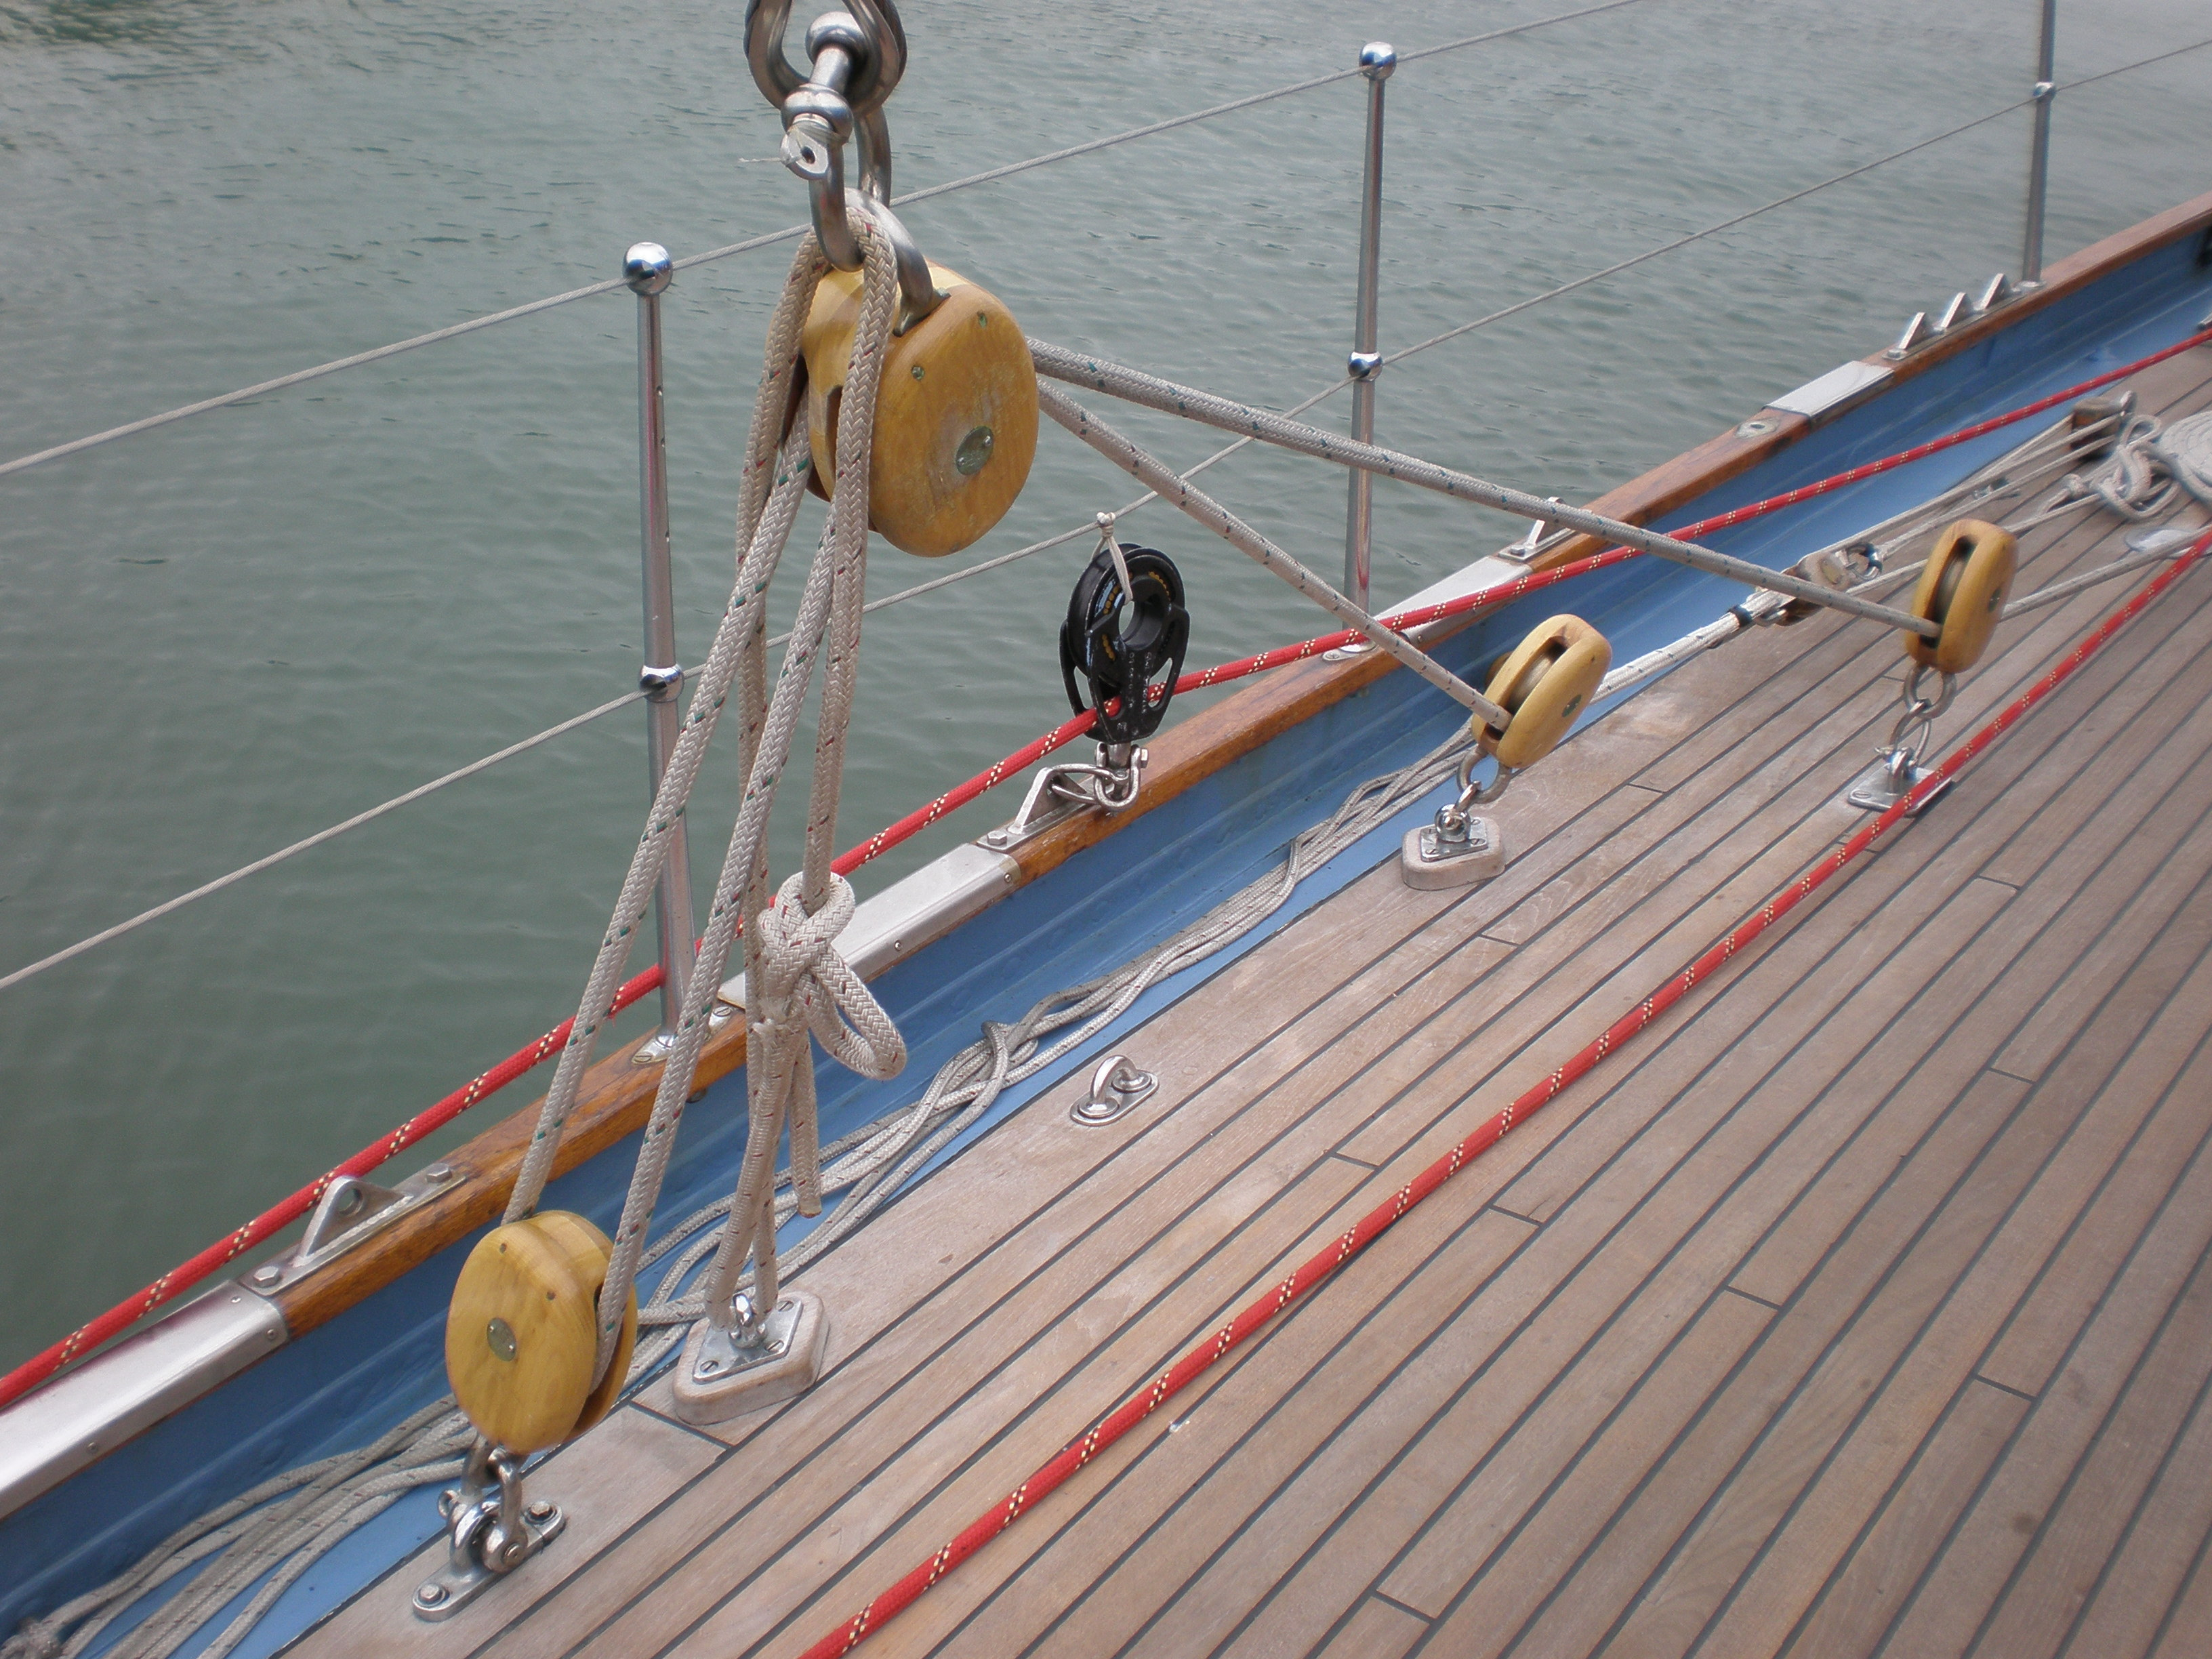 File:HMCS Oriole lines 2 JPG - Wikimedia Commons